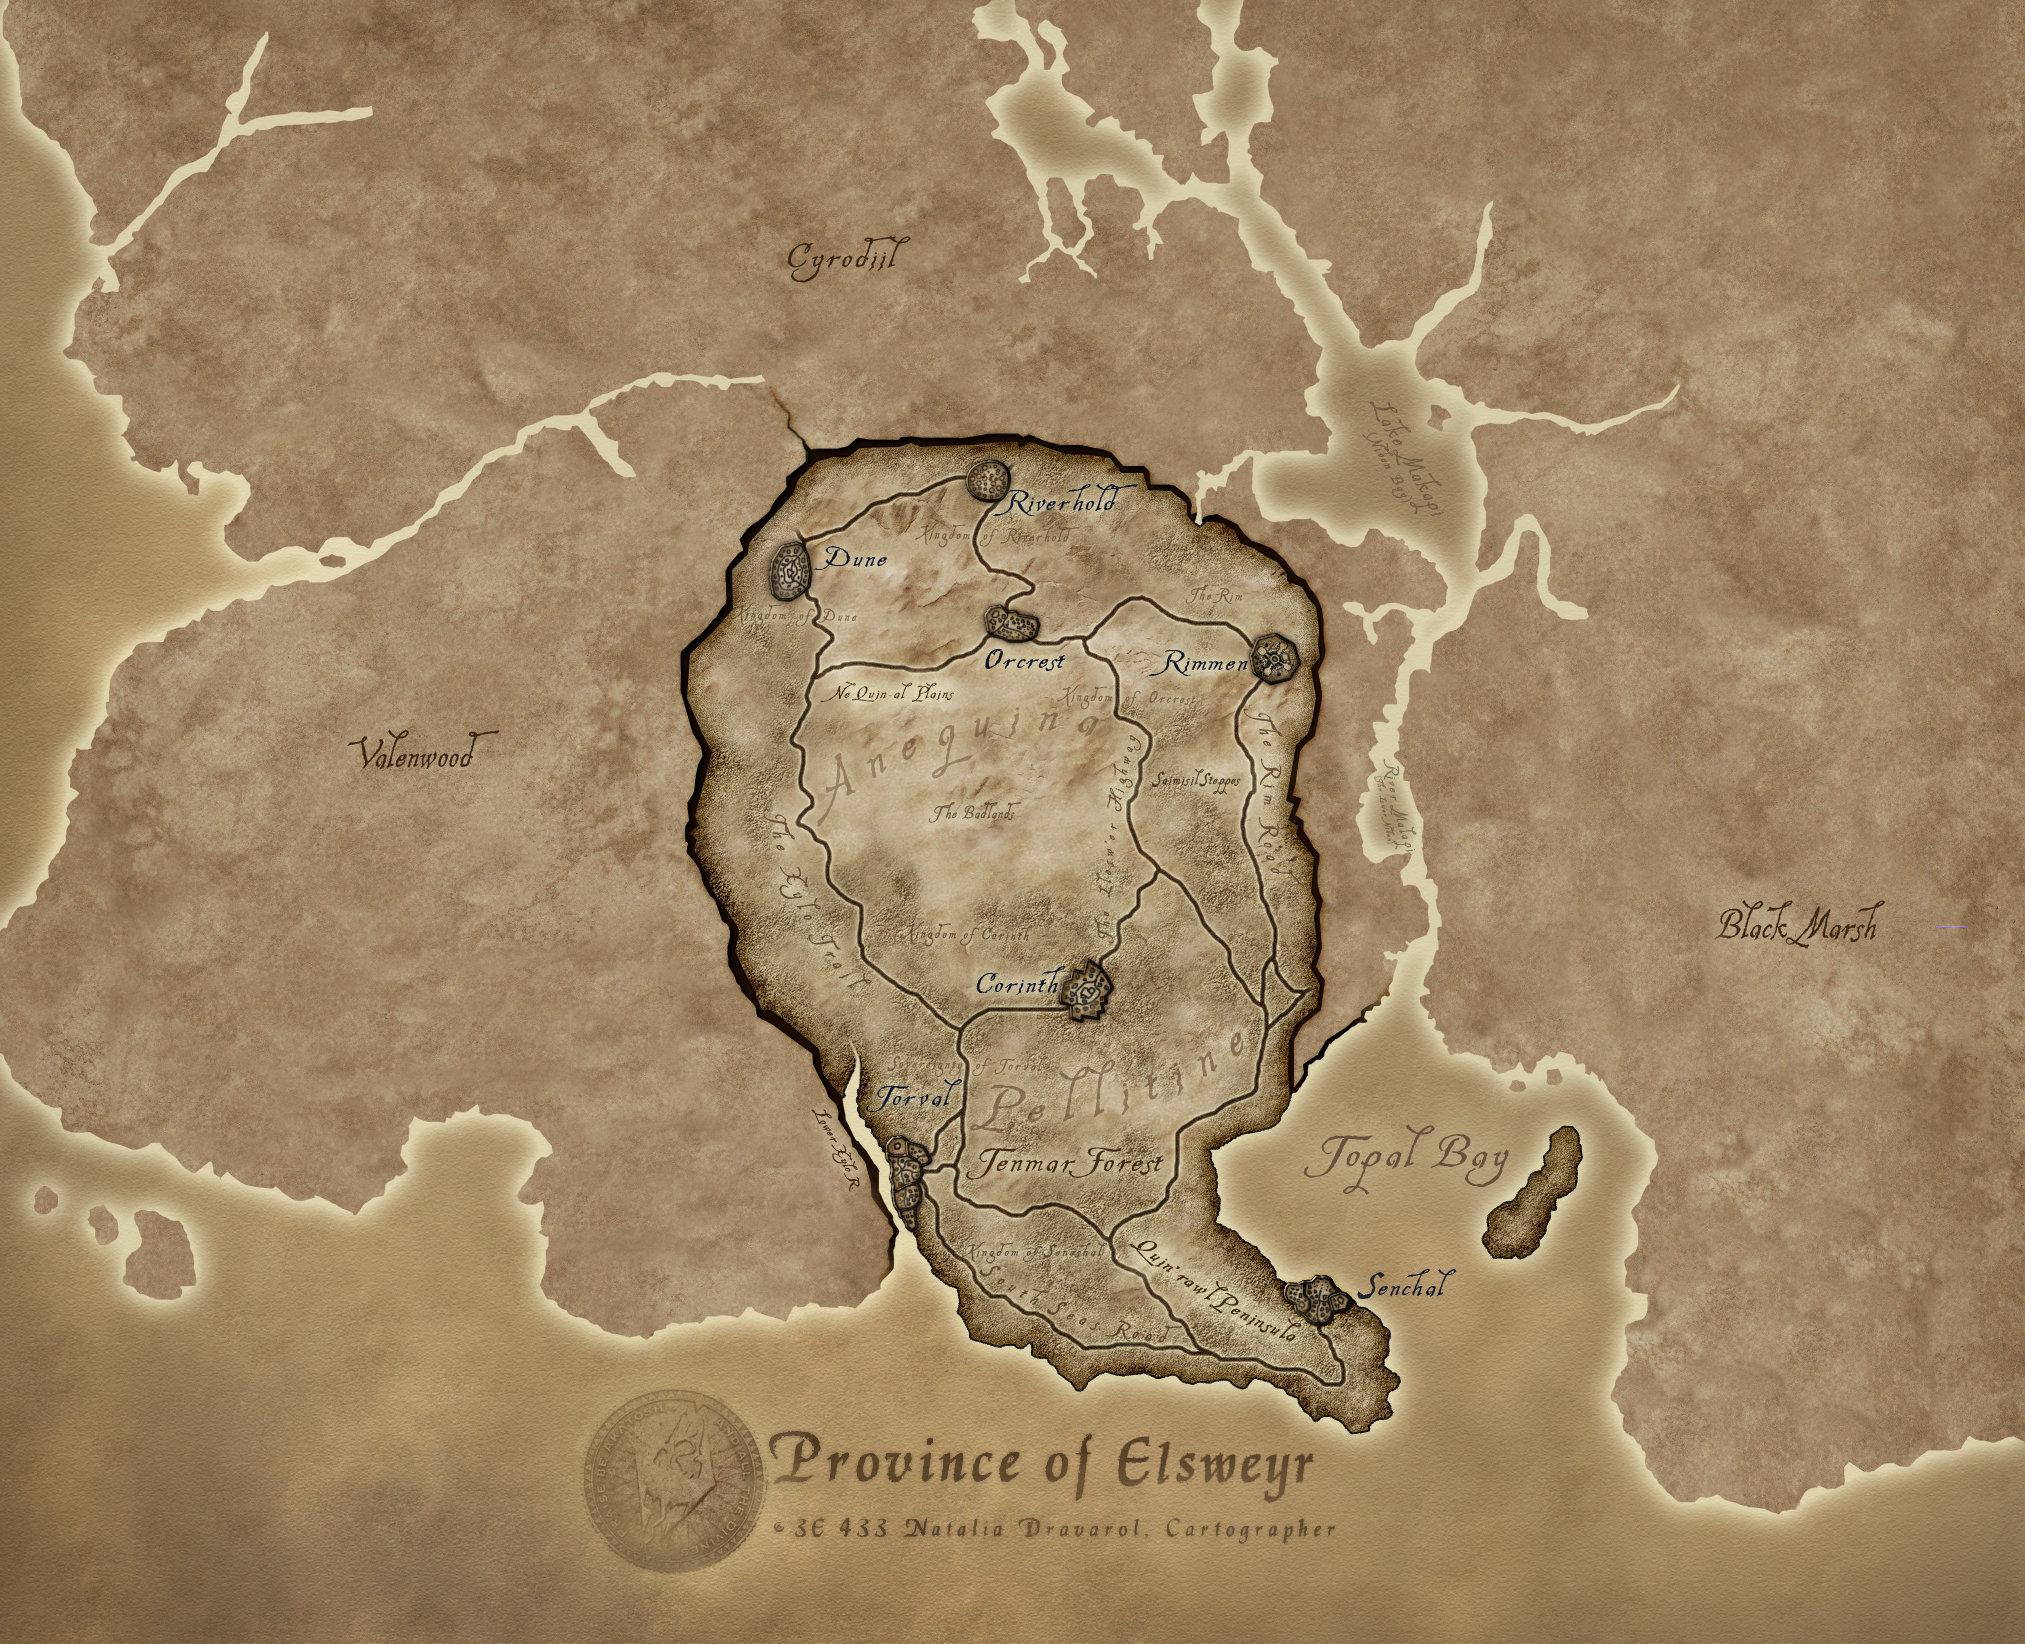 Looking for Elder Scrolls maps to buy : ElderScrolls